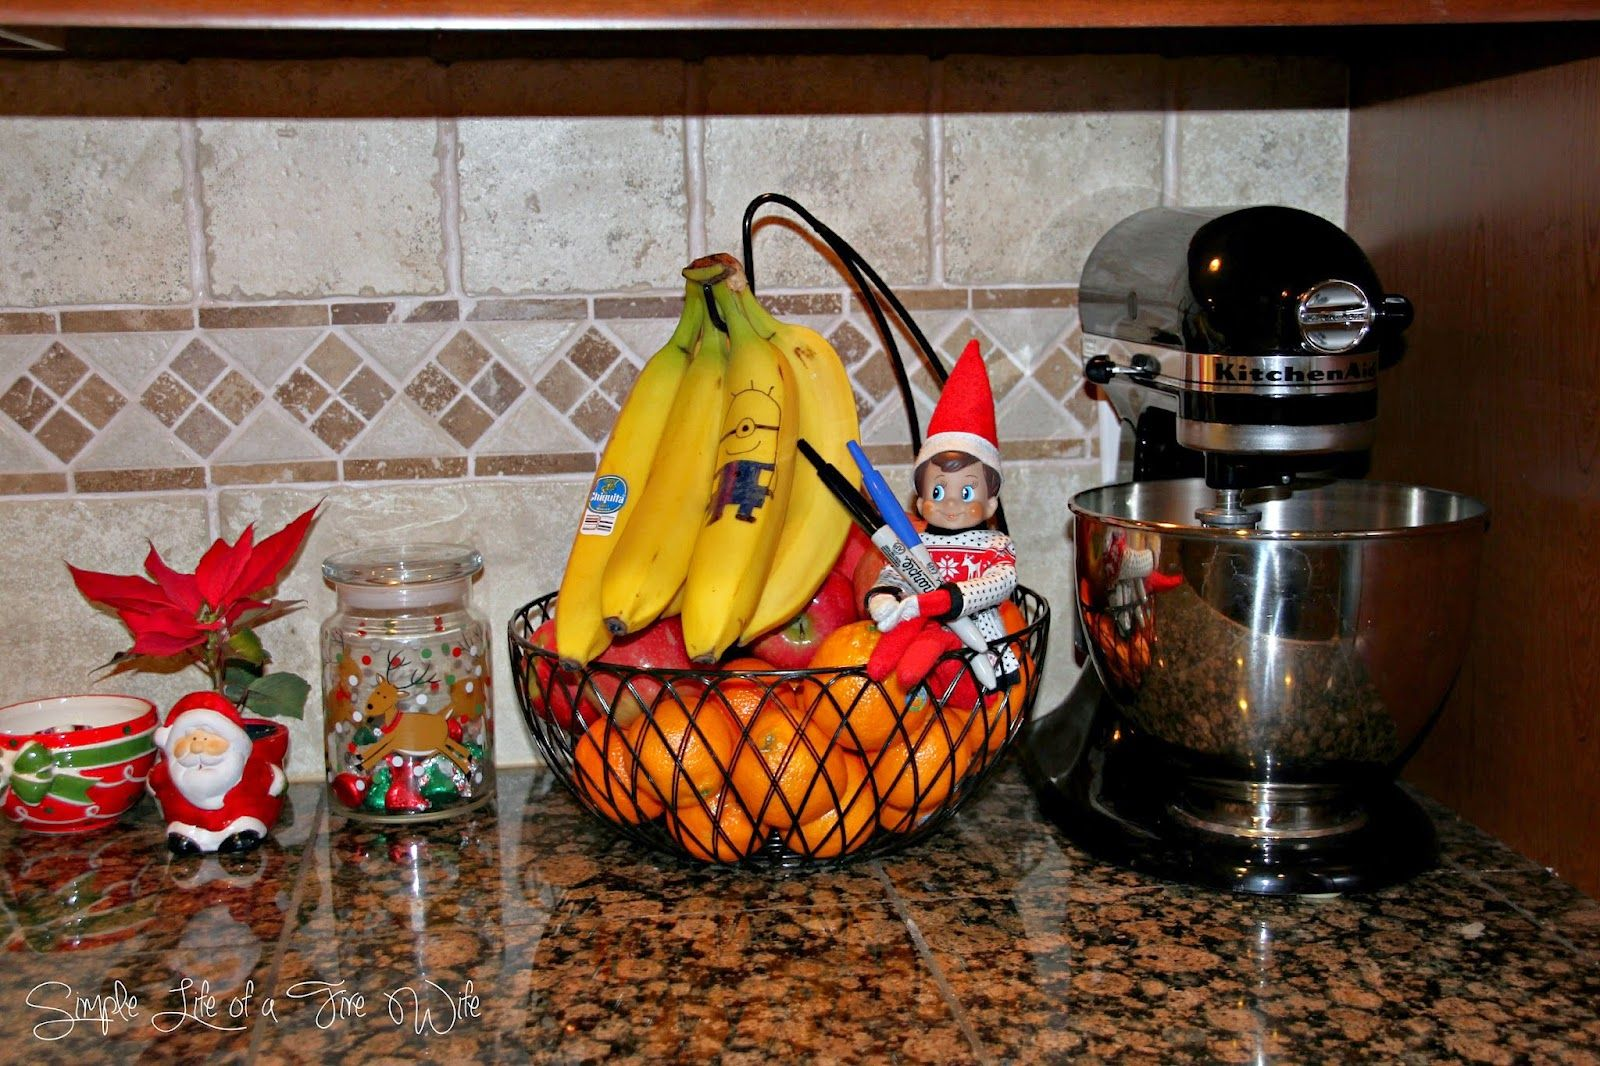 Elf On The Shelf Minion Banana Www Simplelifeofafirewife Com